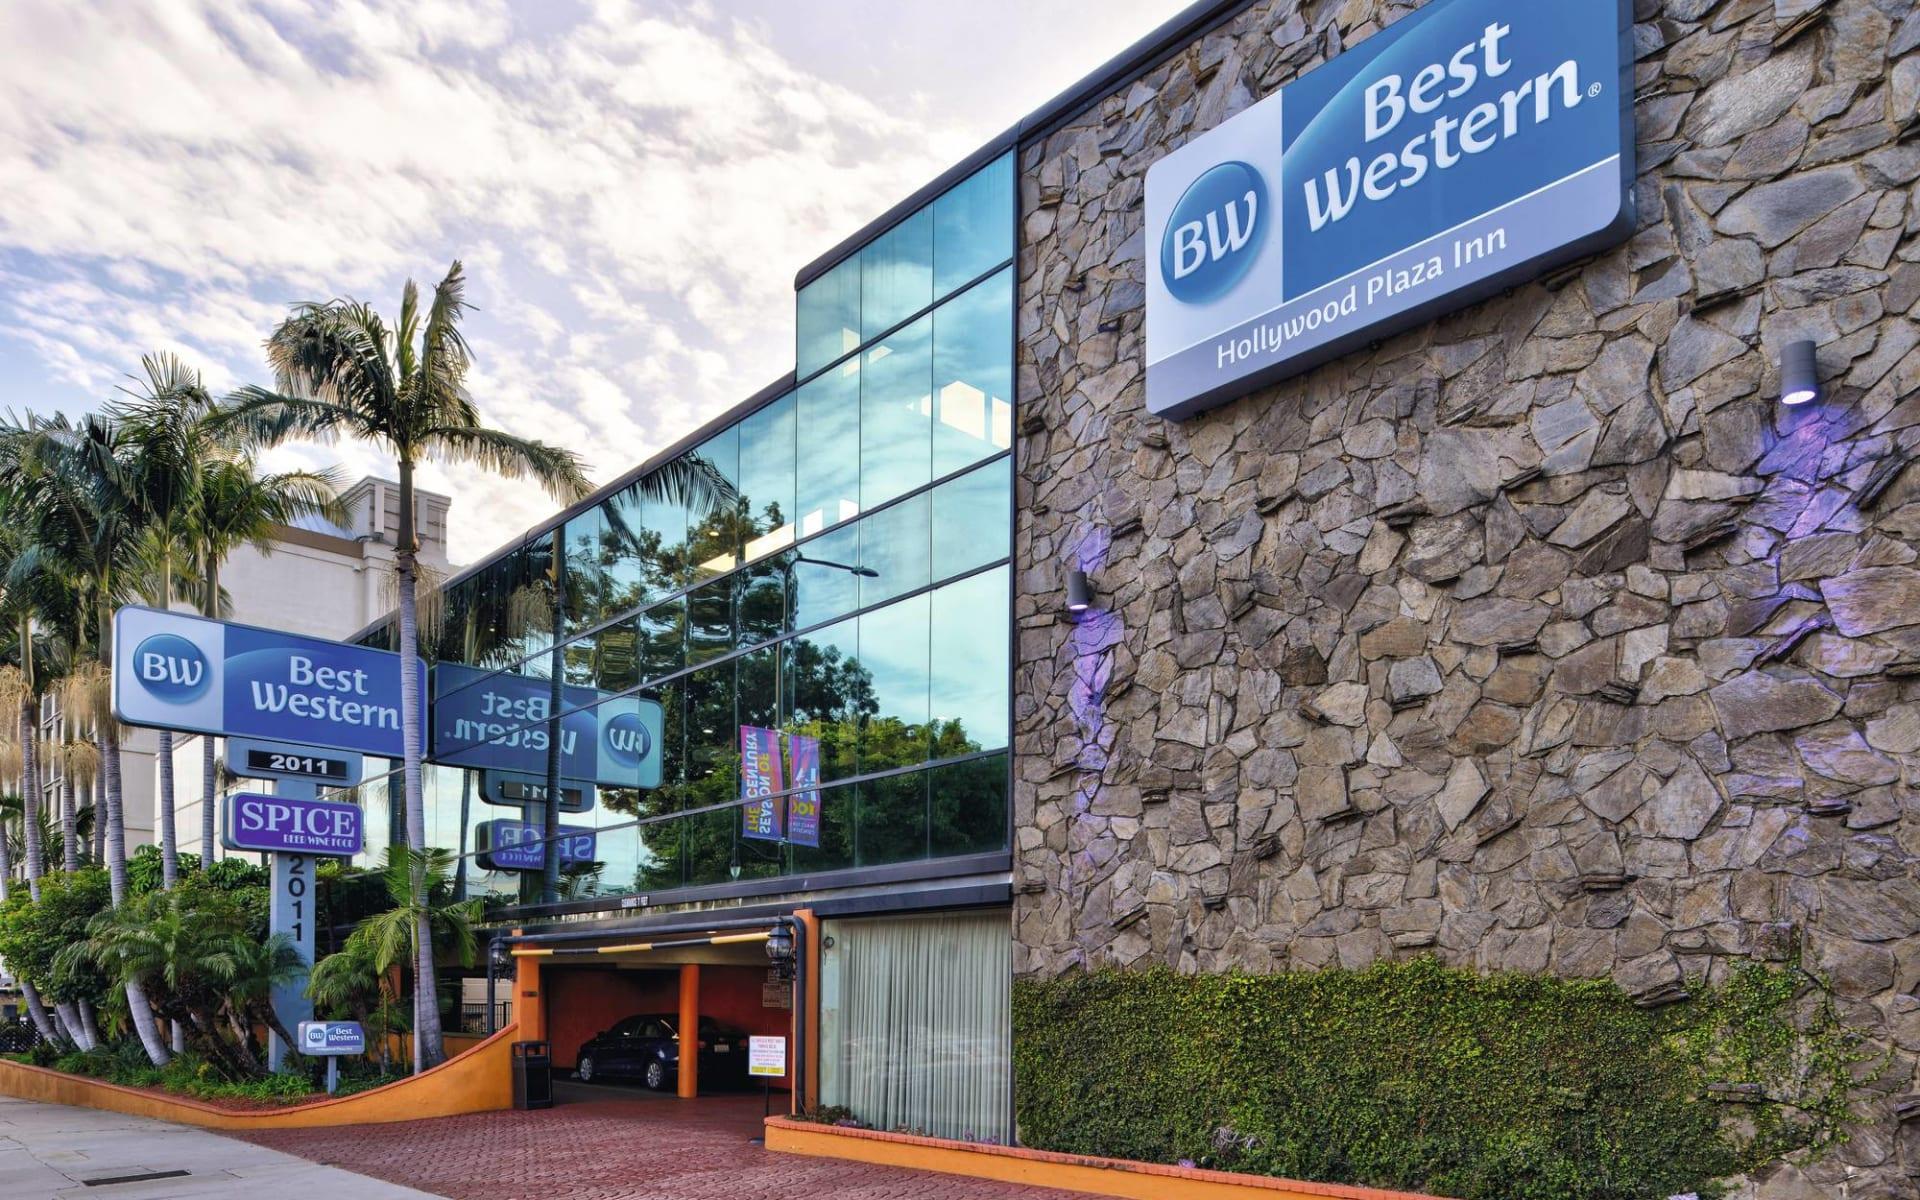 Best Western Hollywood Plaza Inn:  BW Hollywood Plaza Inn - Aussenansicht